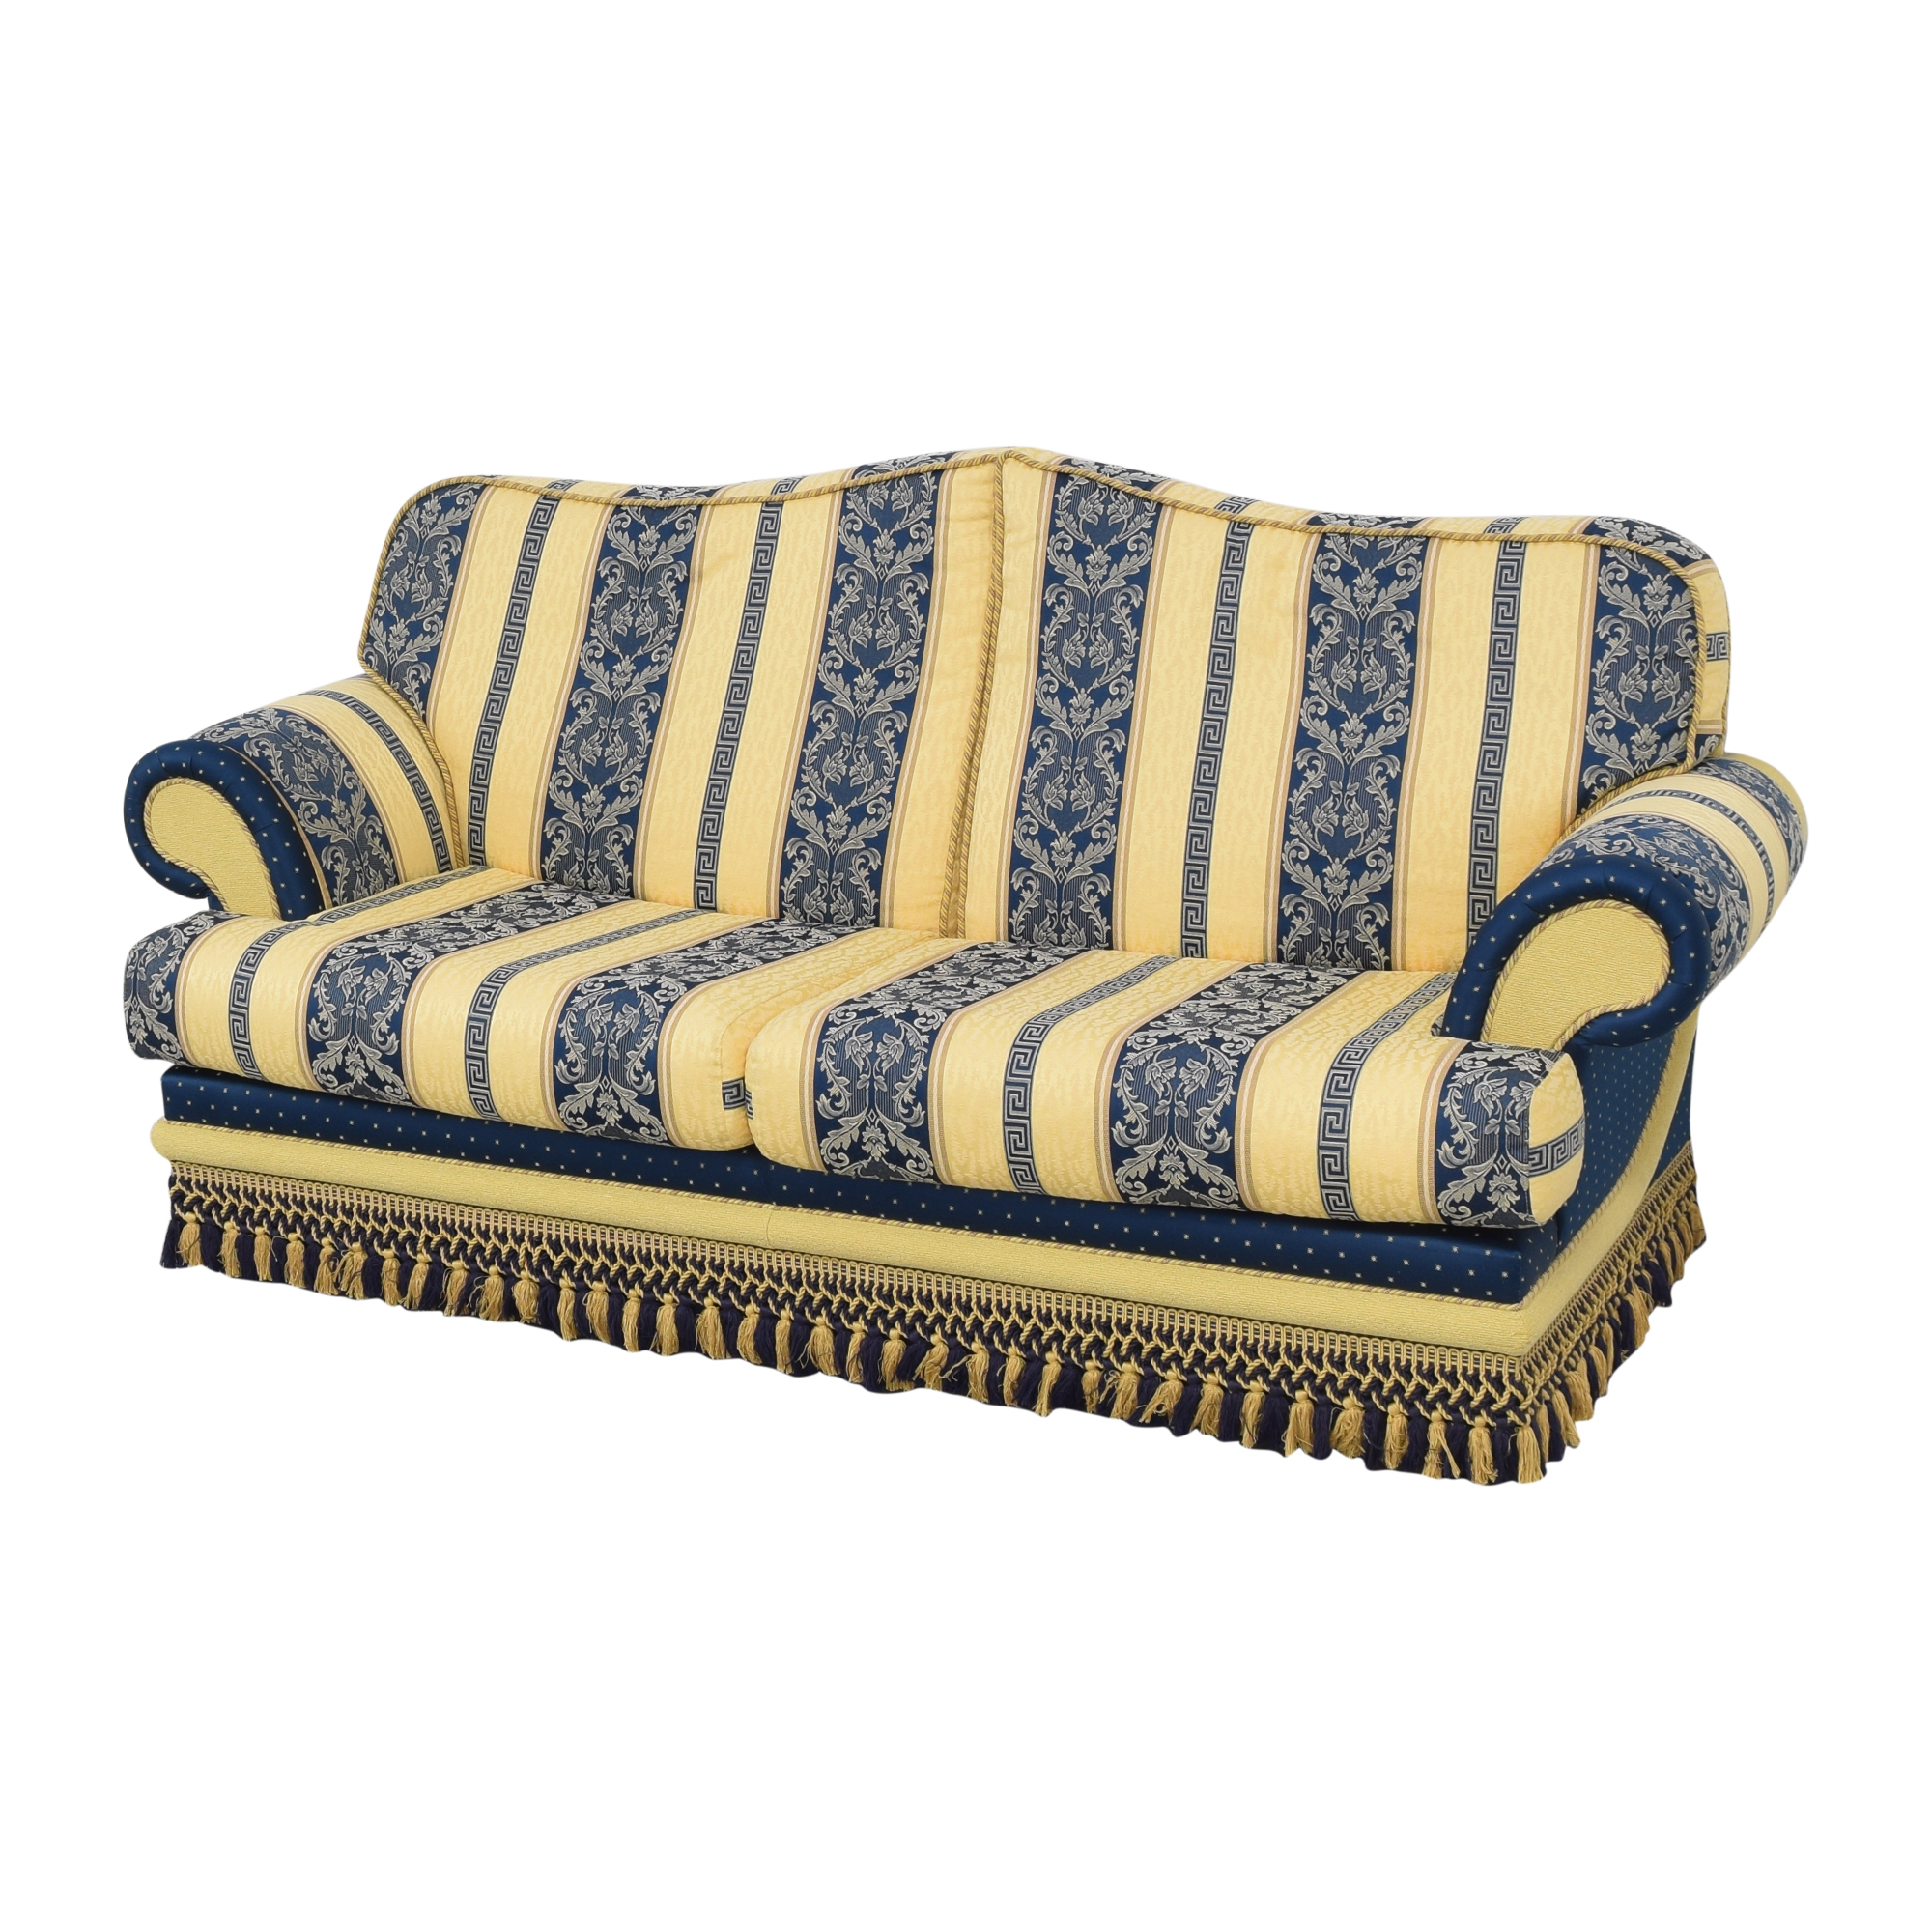 Custom Upholstered Sofa second hand